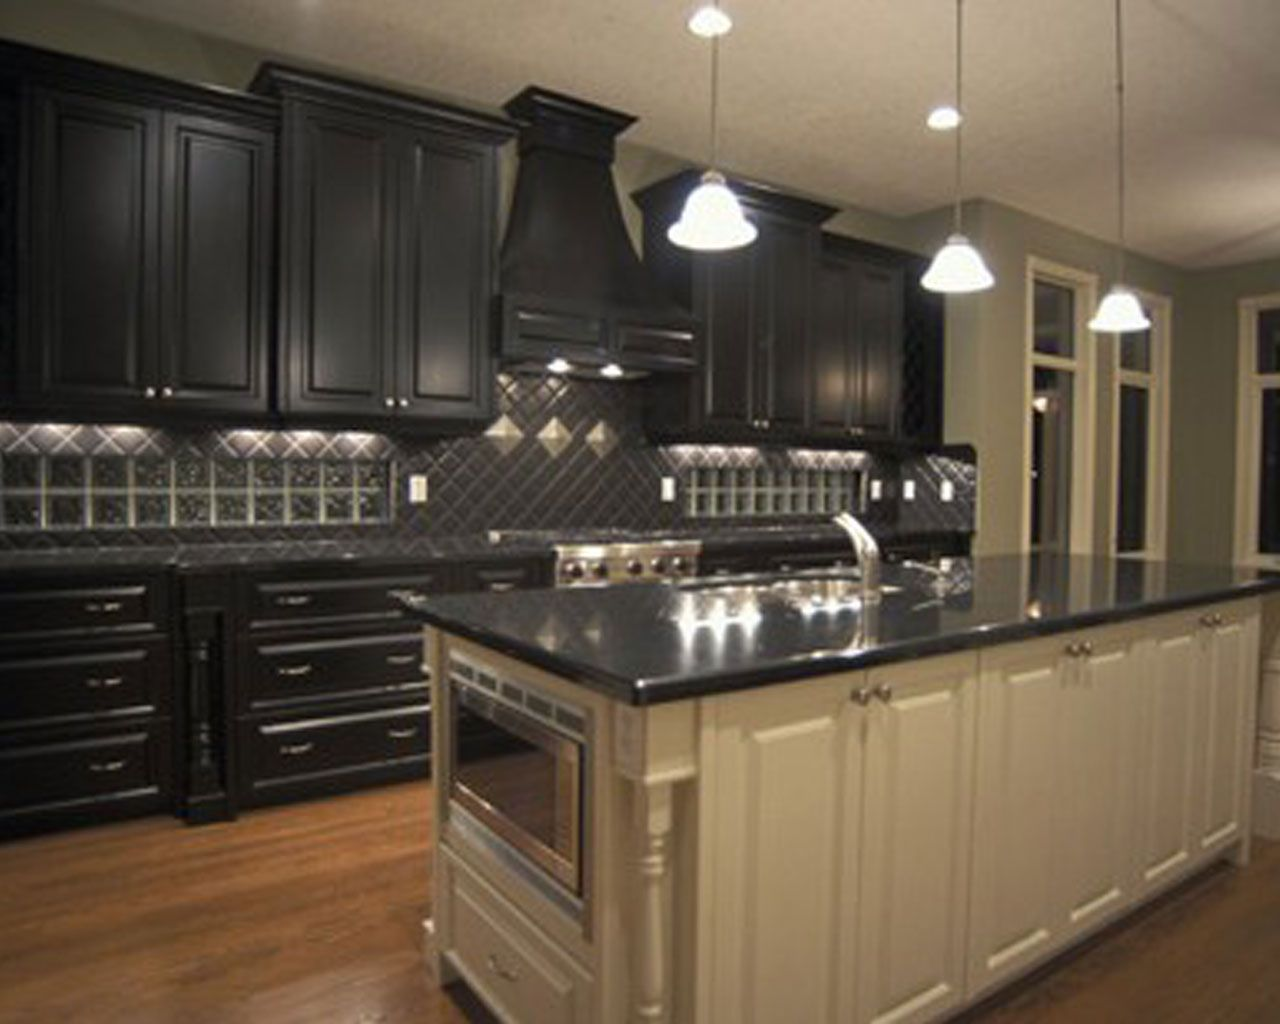 Finest Design Black Kitchen Wallpapers New